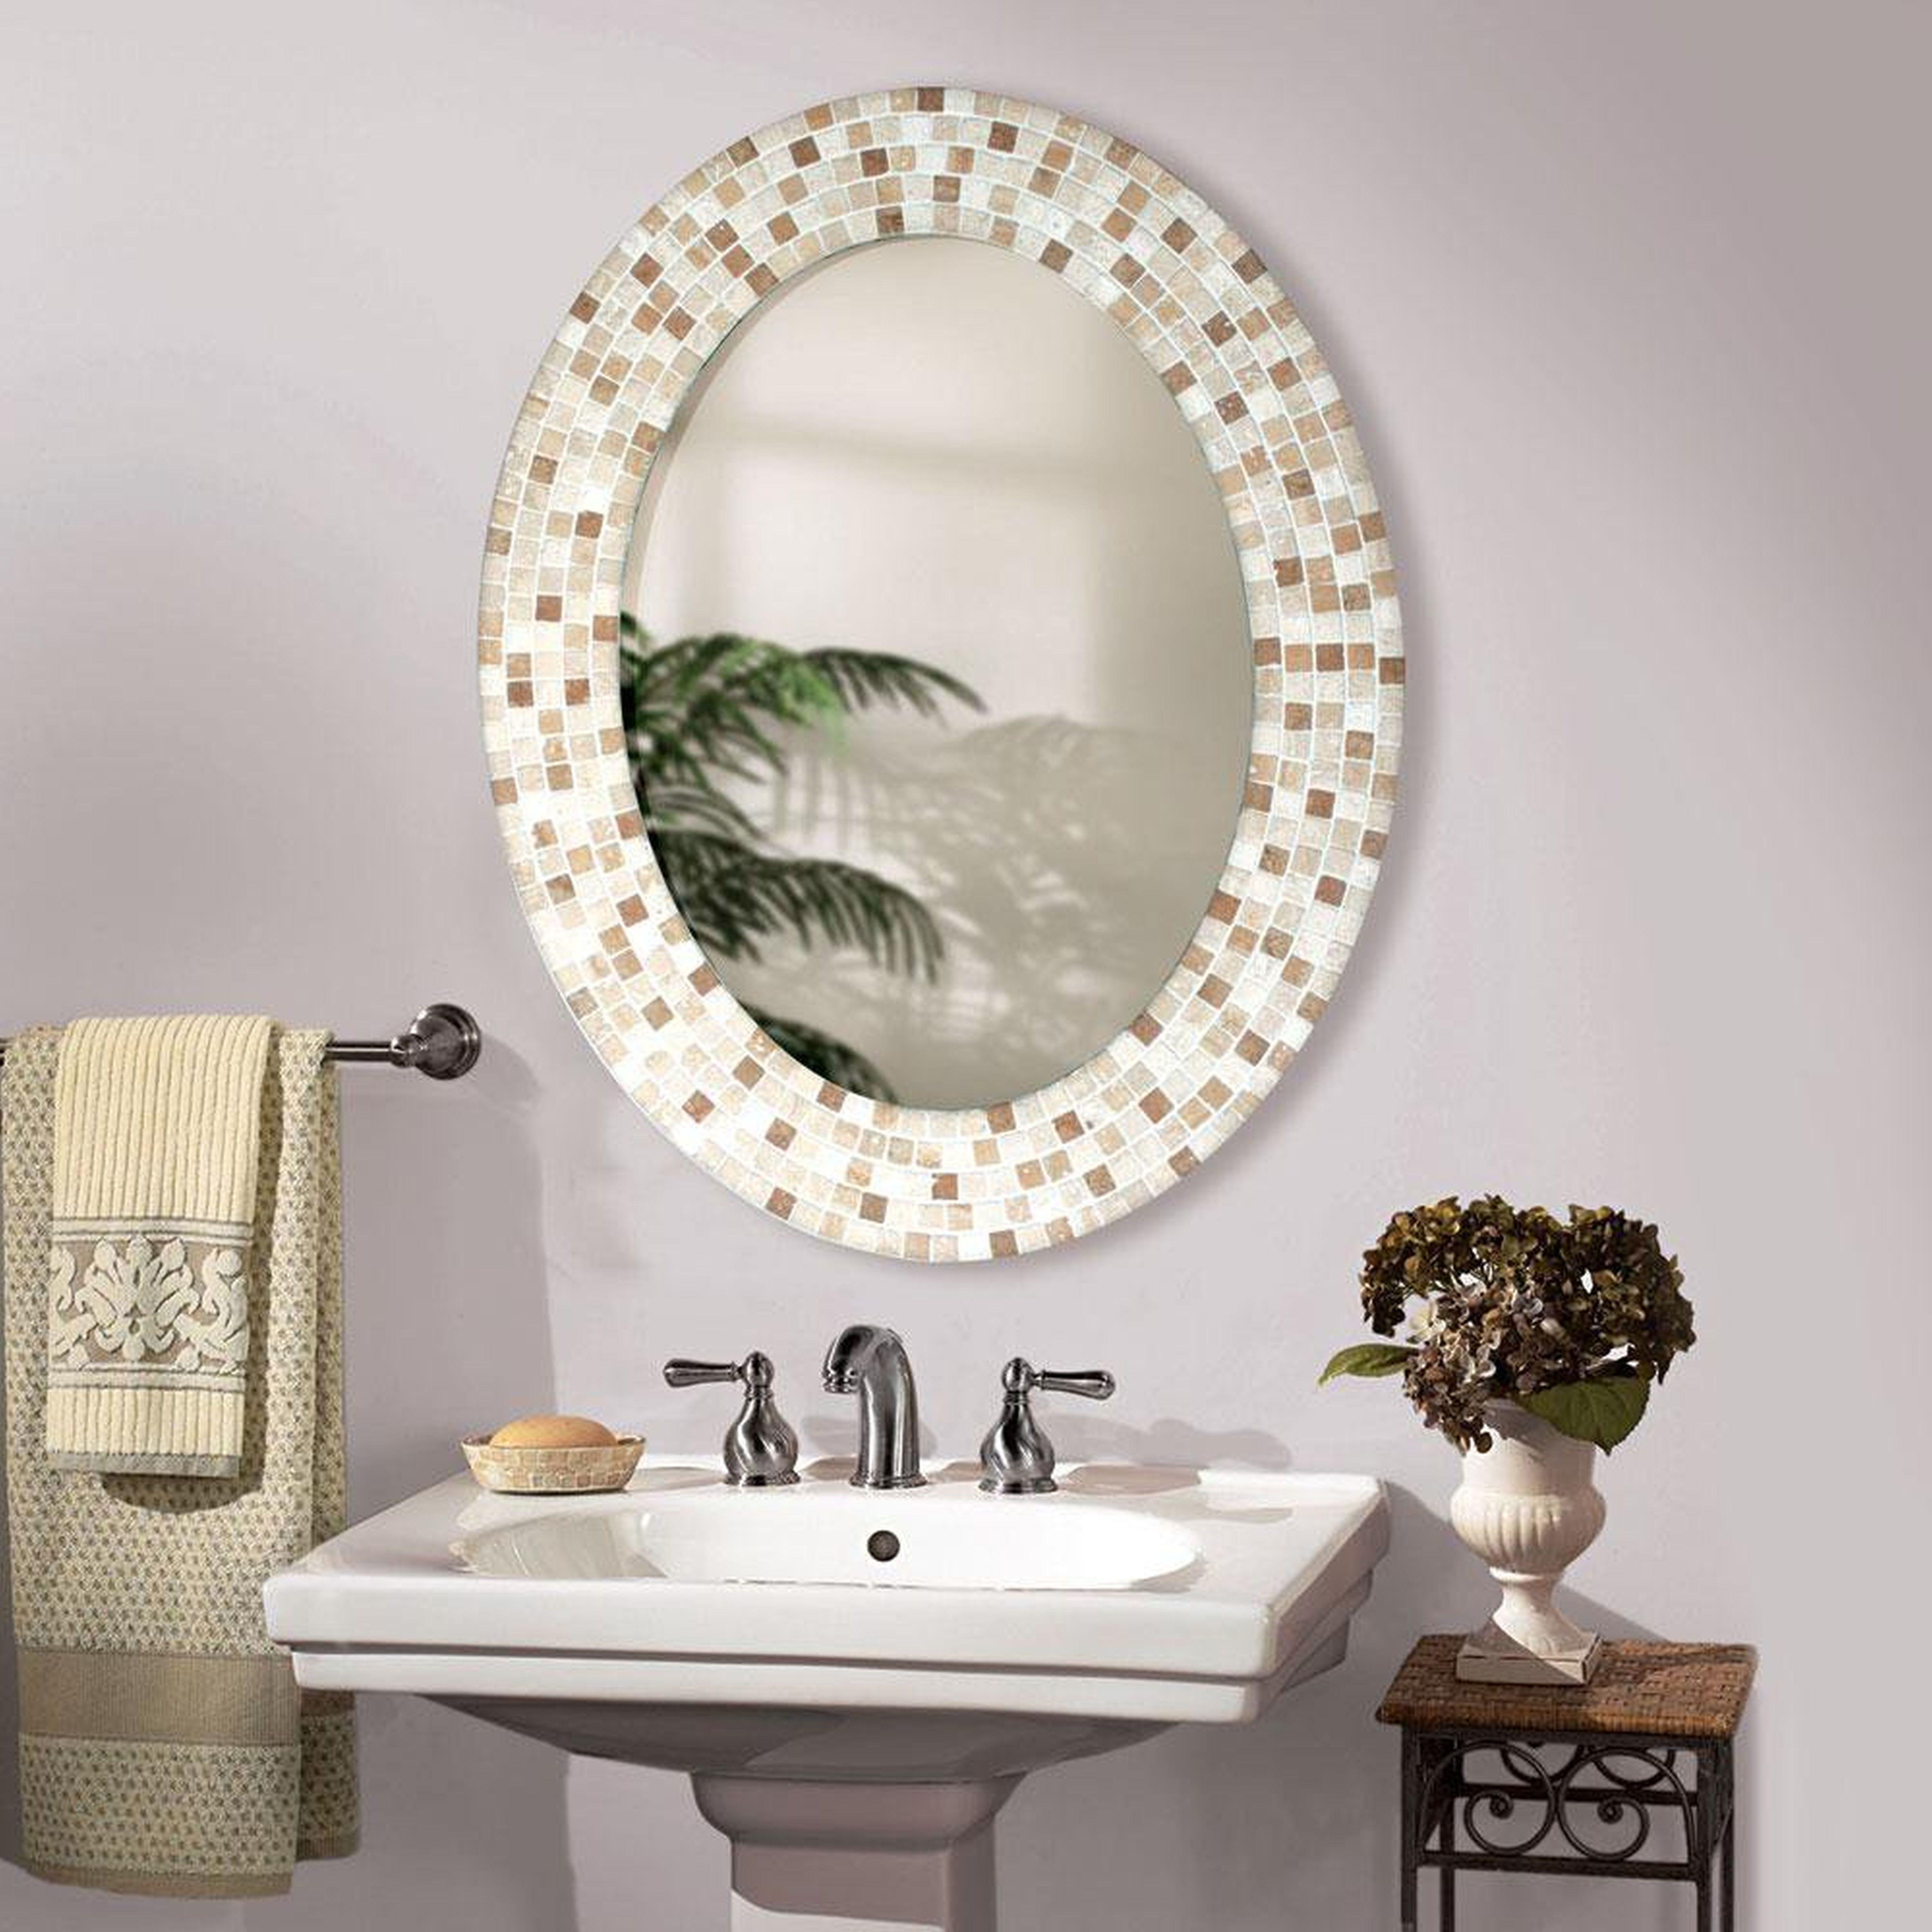 Espresso Oval Wall Mirror | http://drrw.us | Pinterest | Espresso ...